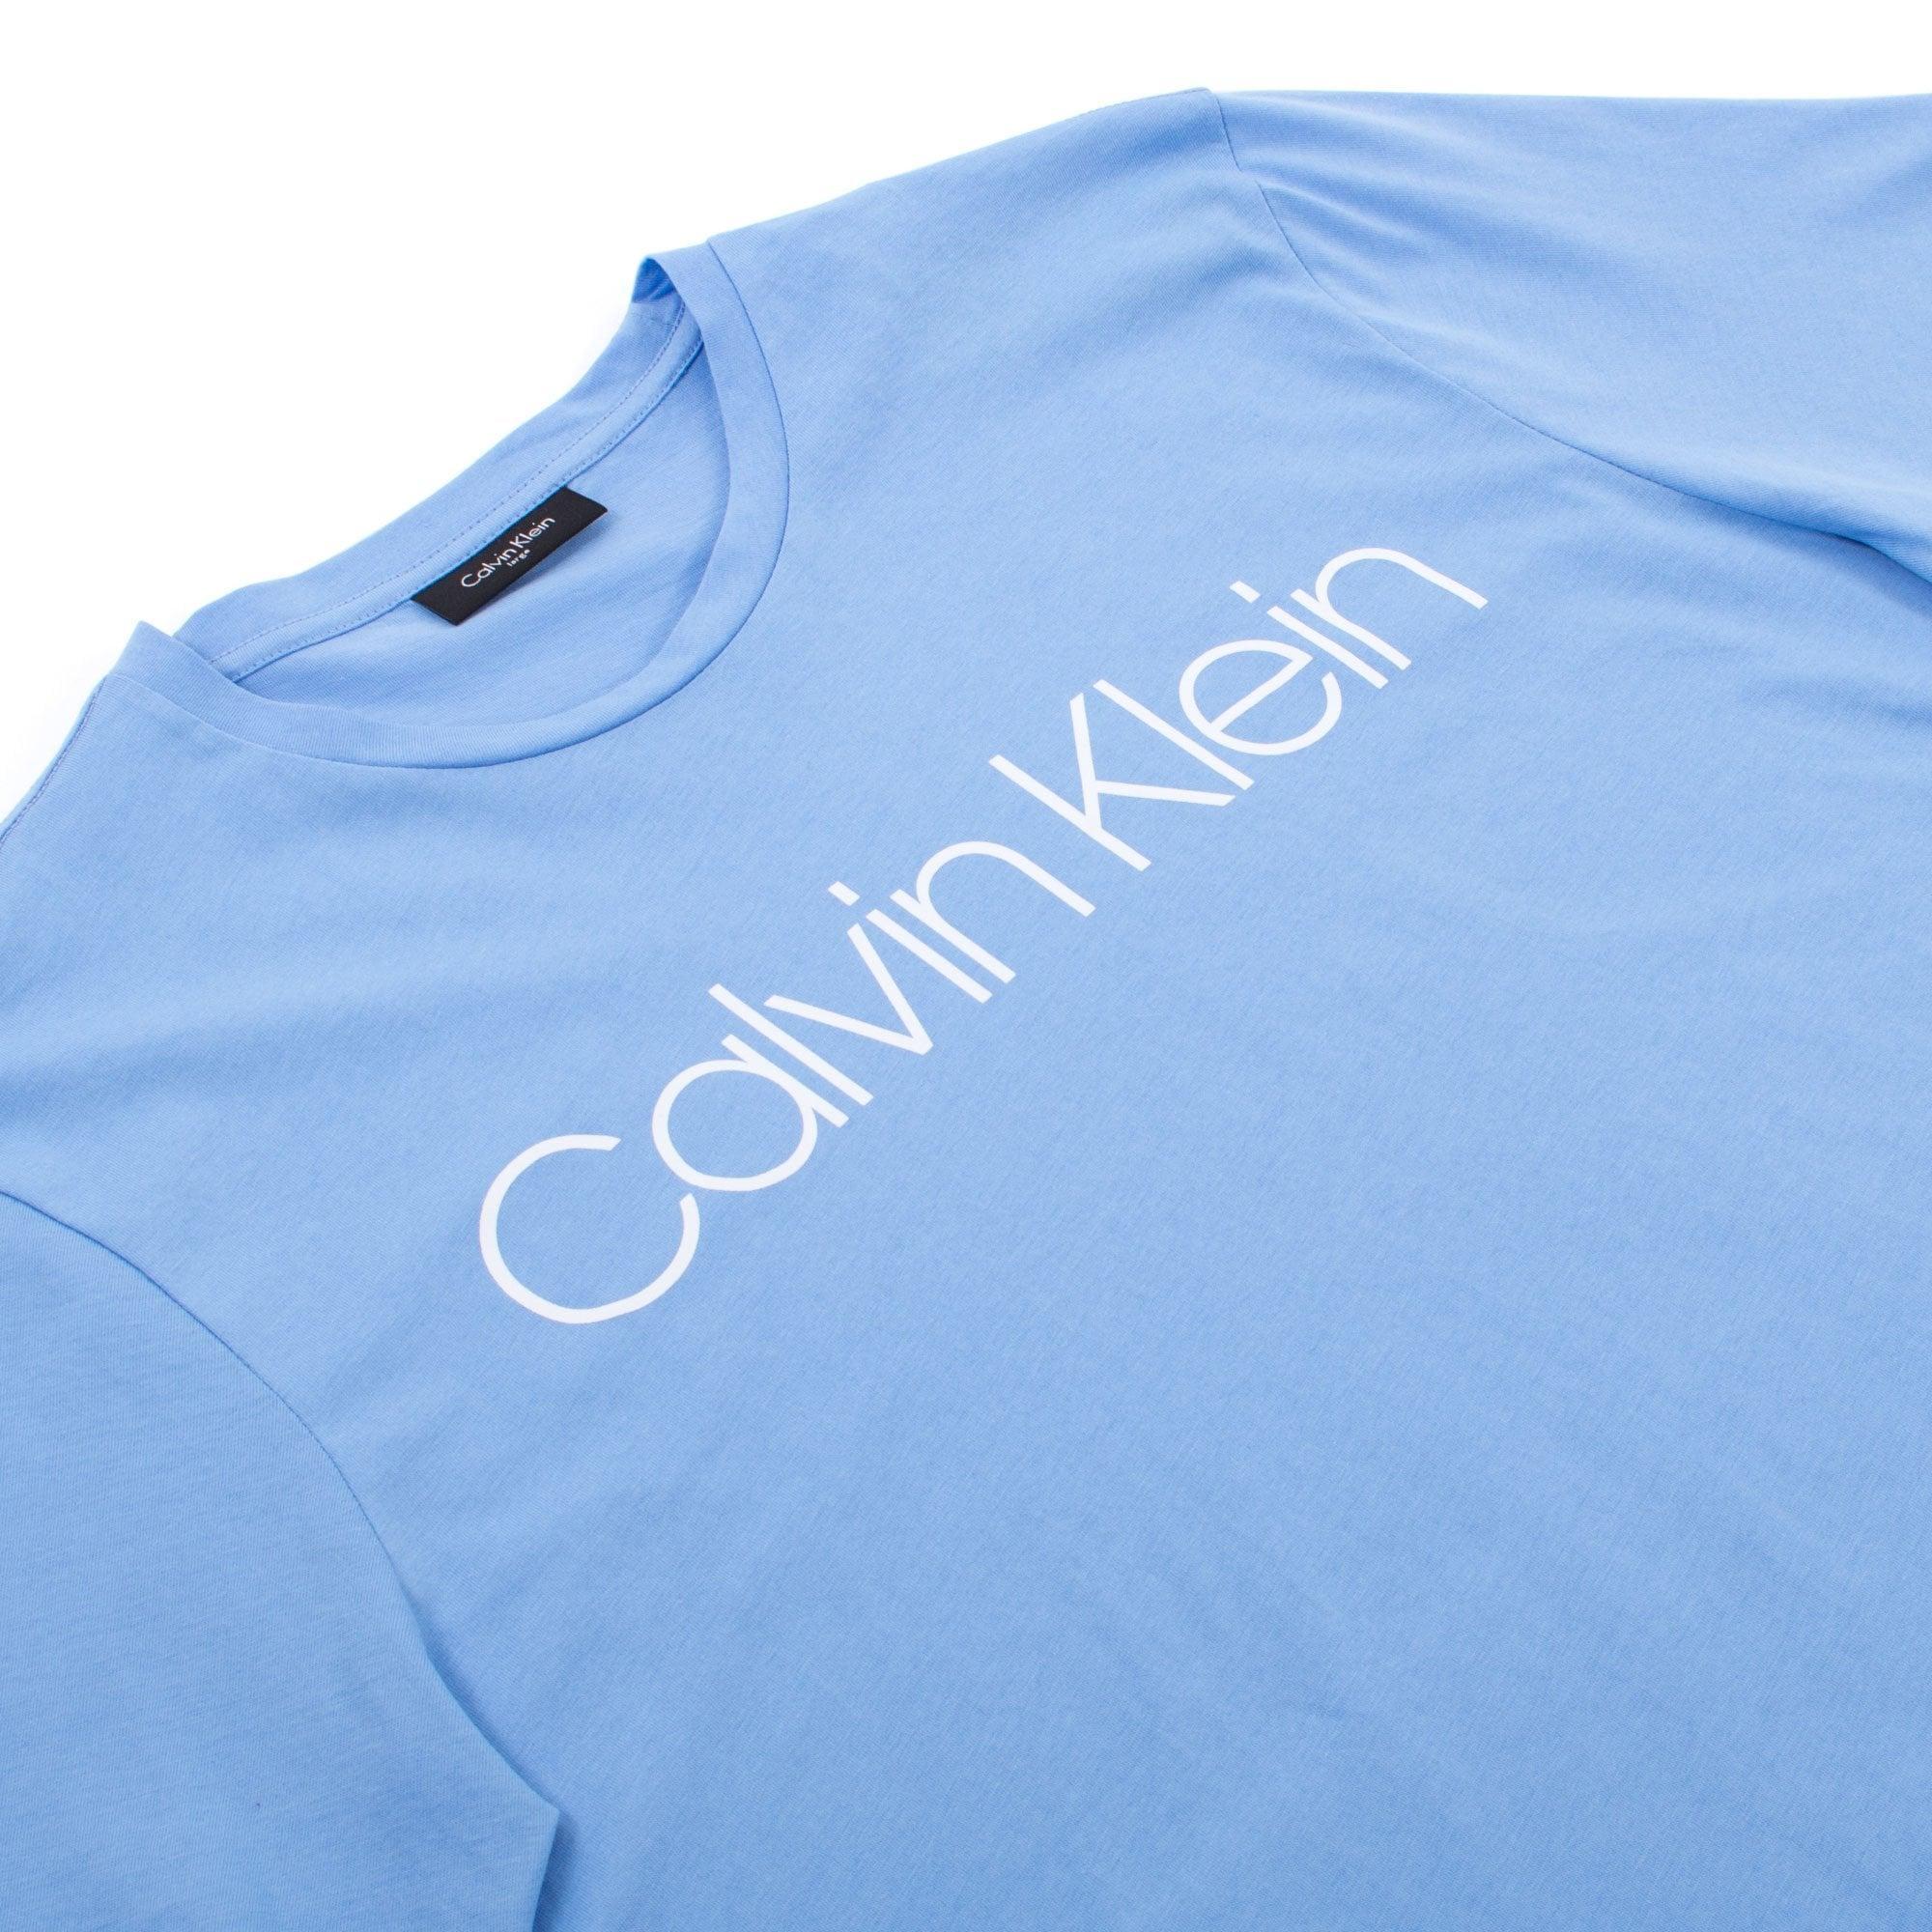 6da69cfd7 ... Blue Jasa Logo Print T-shirt for Men - Lyst. View fullscreen